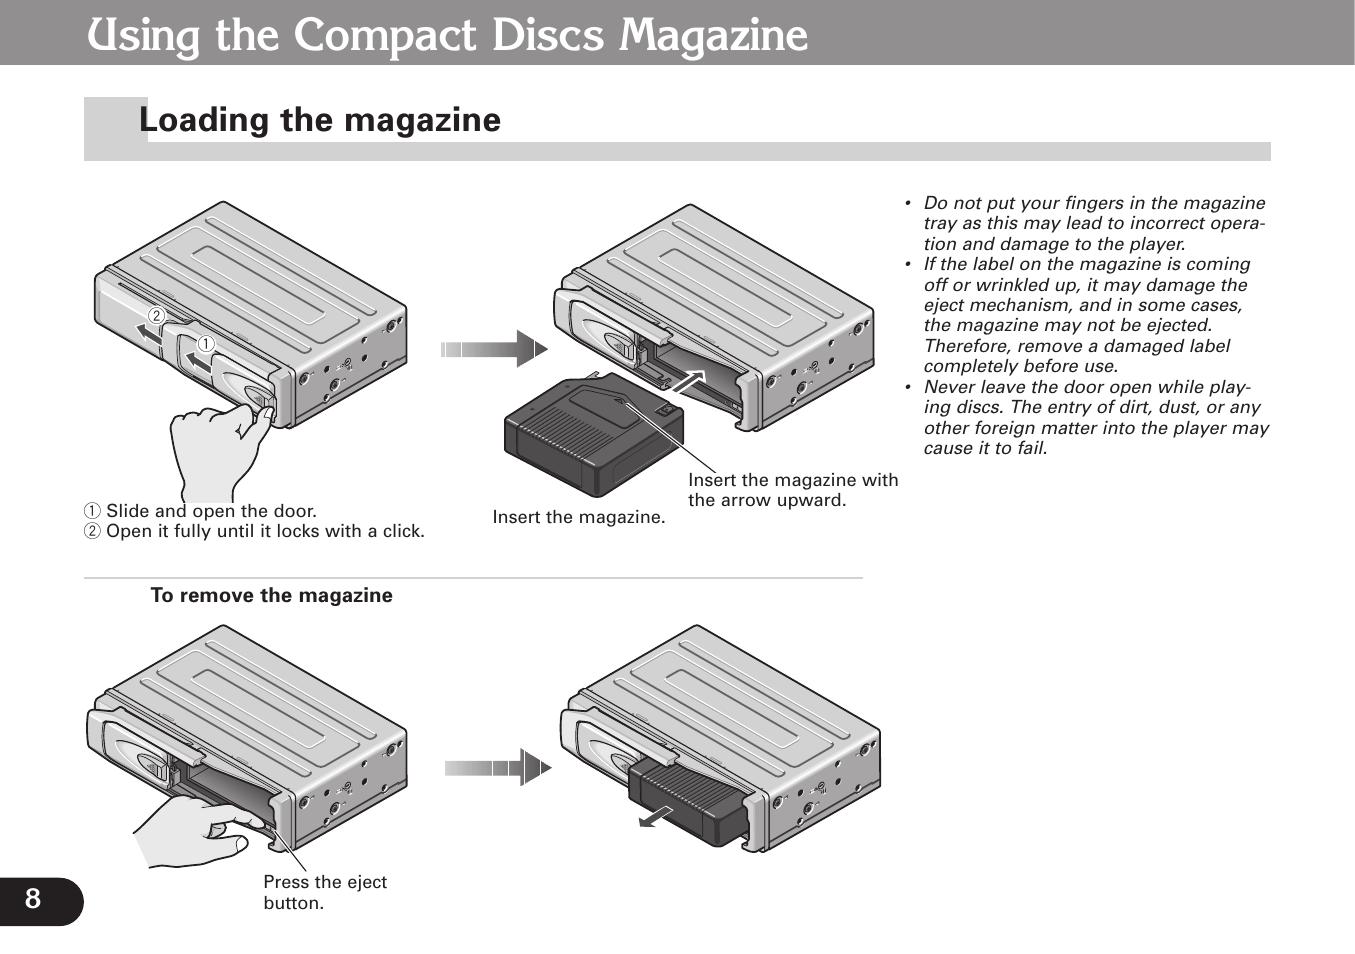 Loading the magazine, Using the compact discs magazine